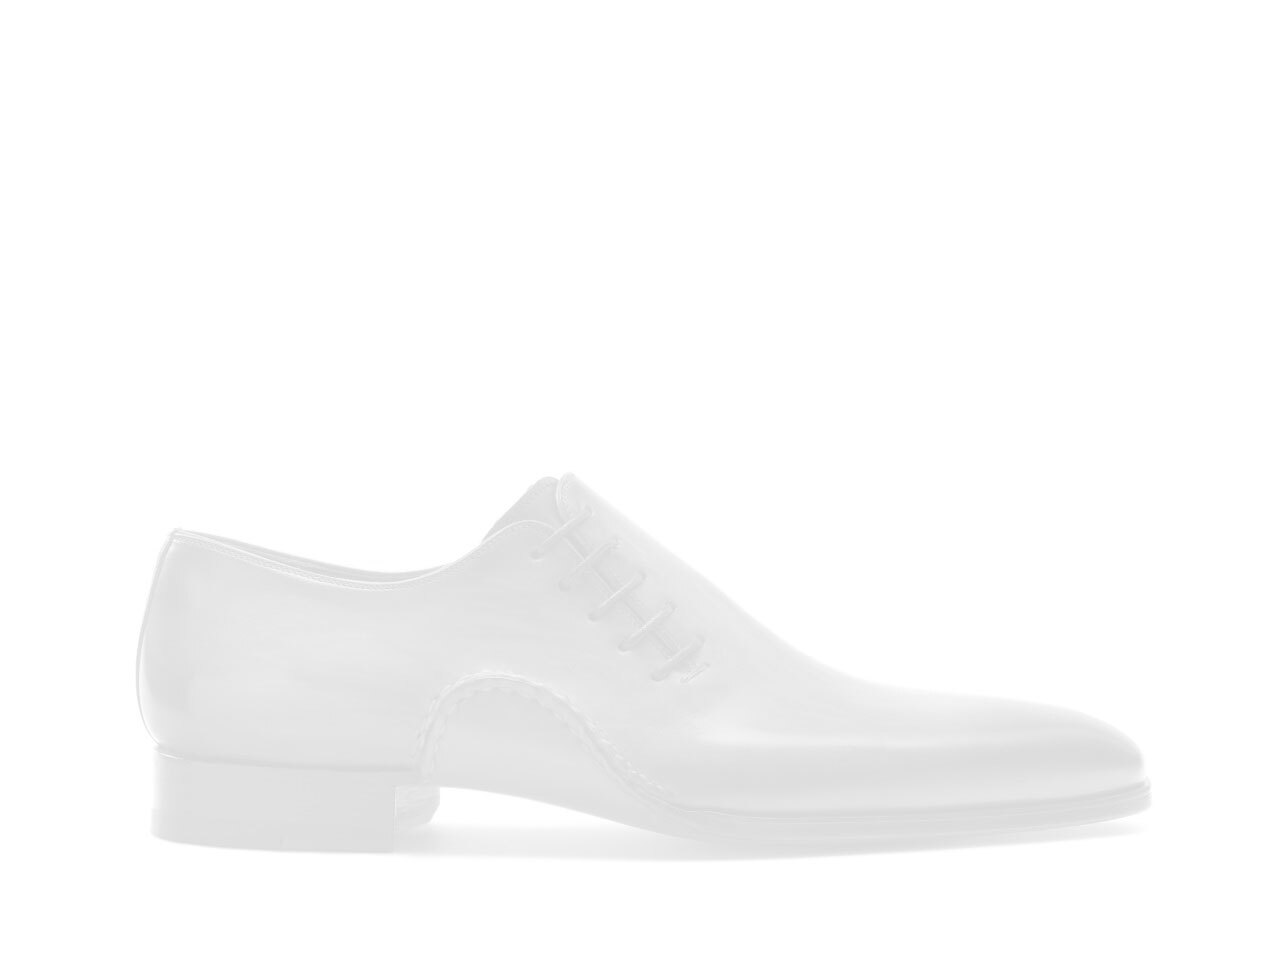 Pair of the Magnanni Spero White Men's Sneakers